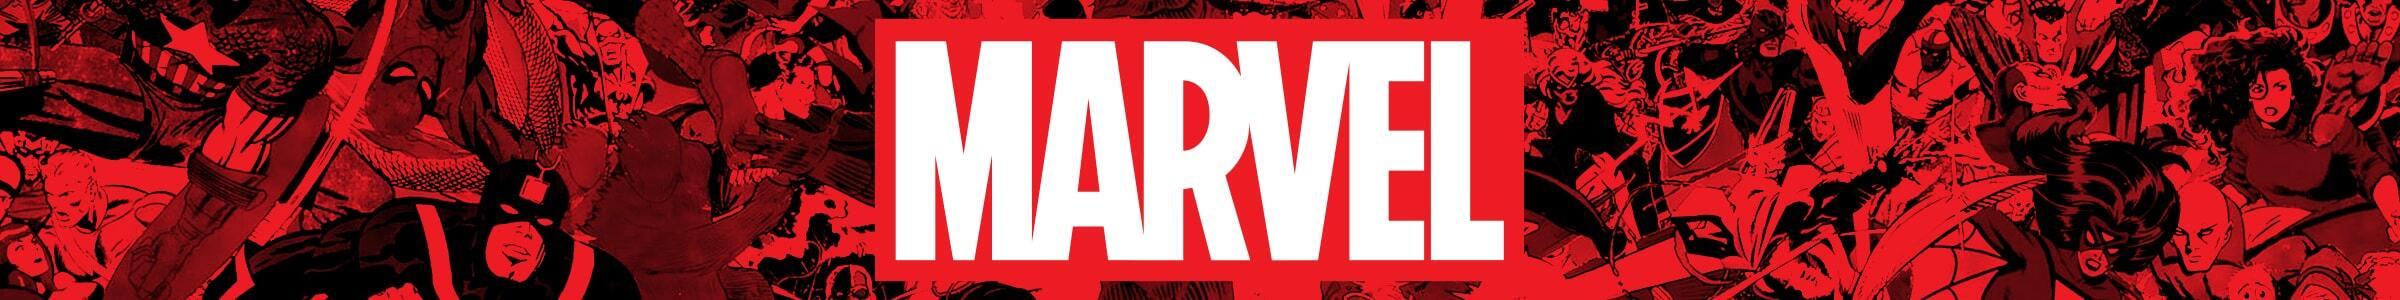 Category_Teaser_Header_Marvel_3_2400x300